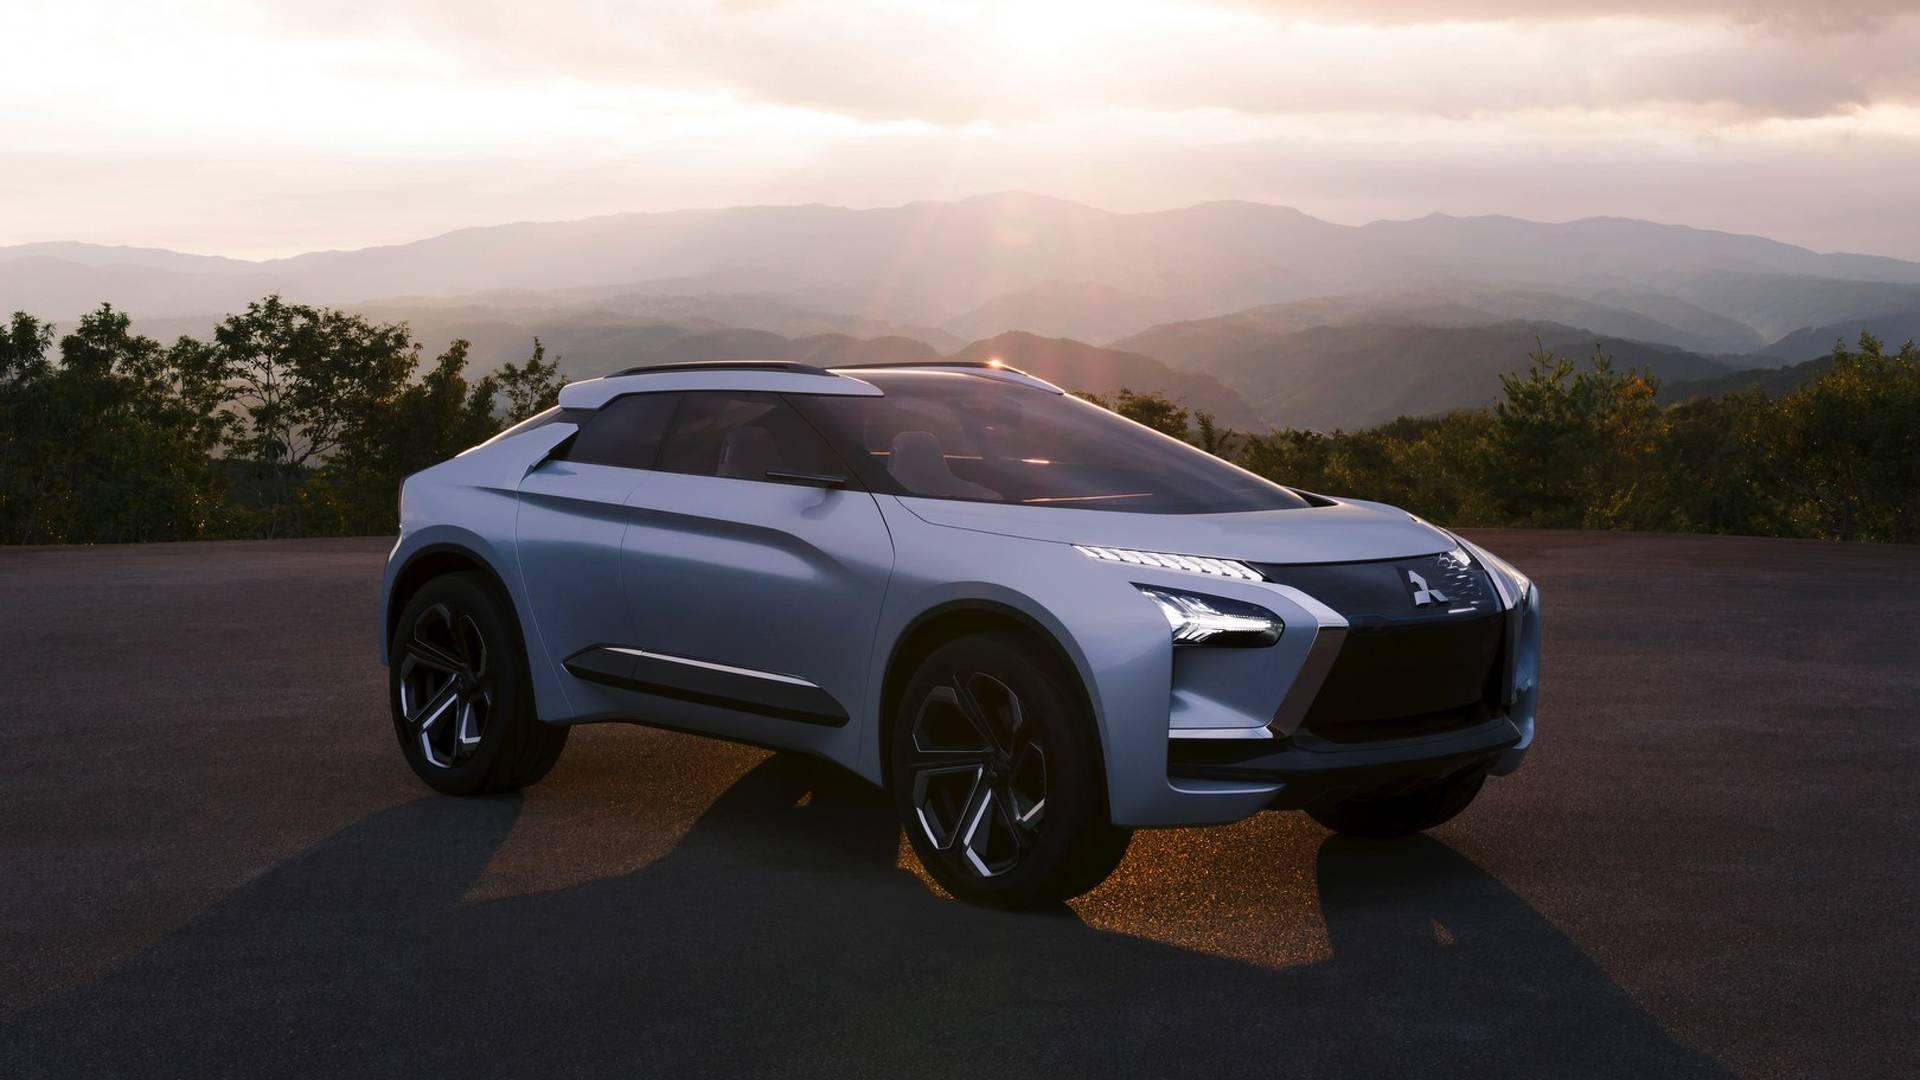 Future Car Hd Wallpaper Mitsubishi Lancer Evo X Final Concept Boasts With 473